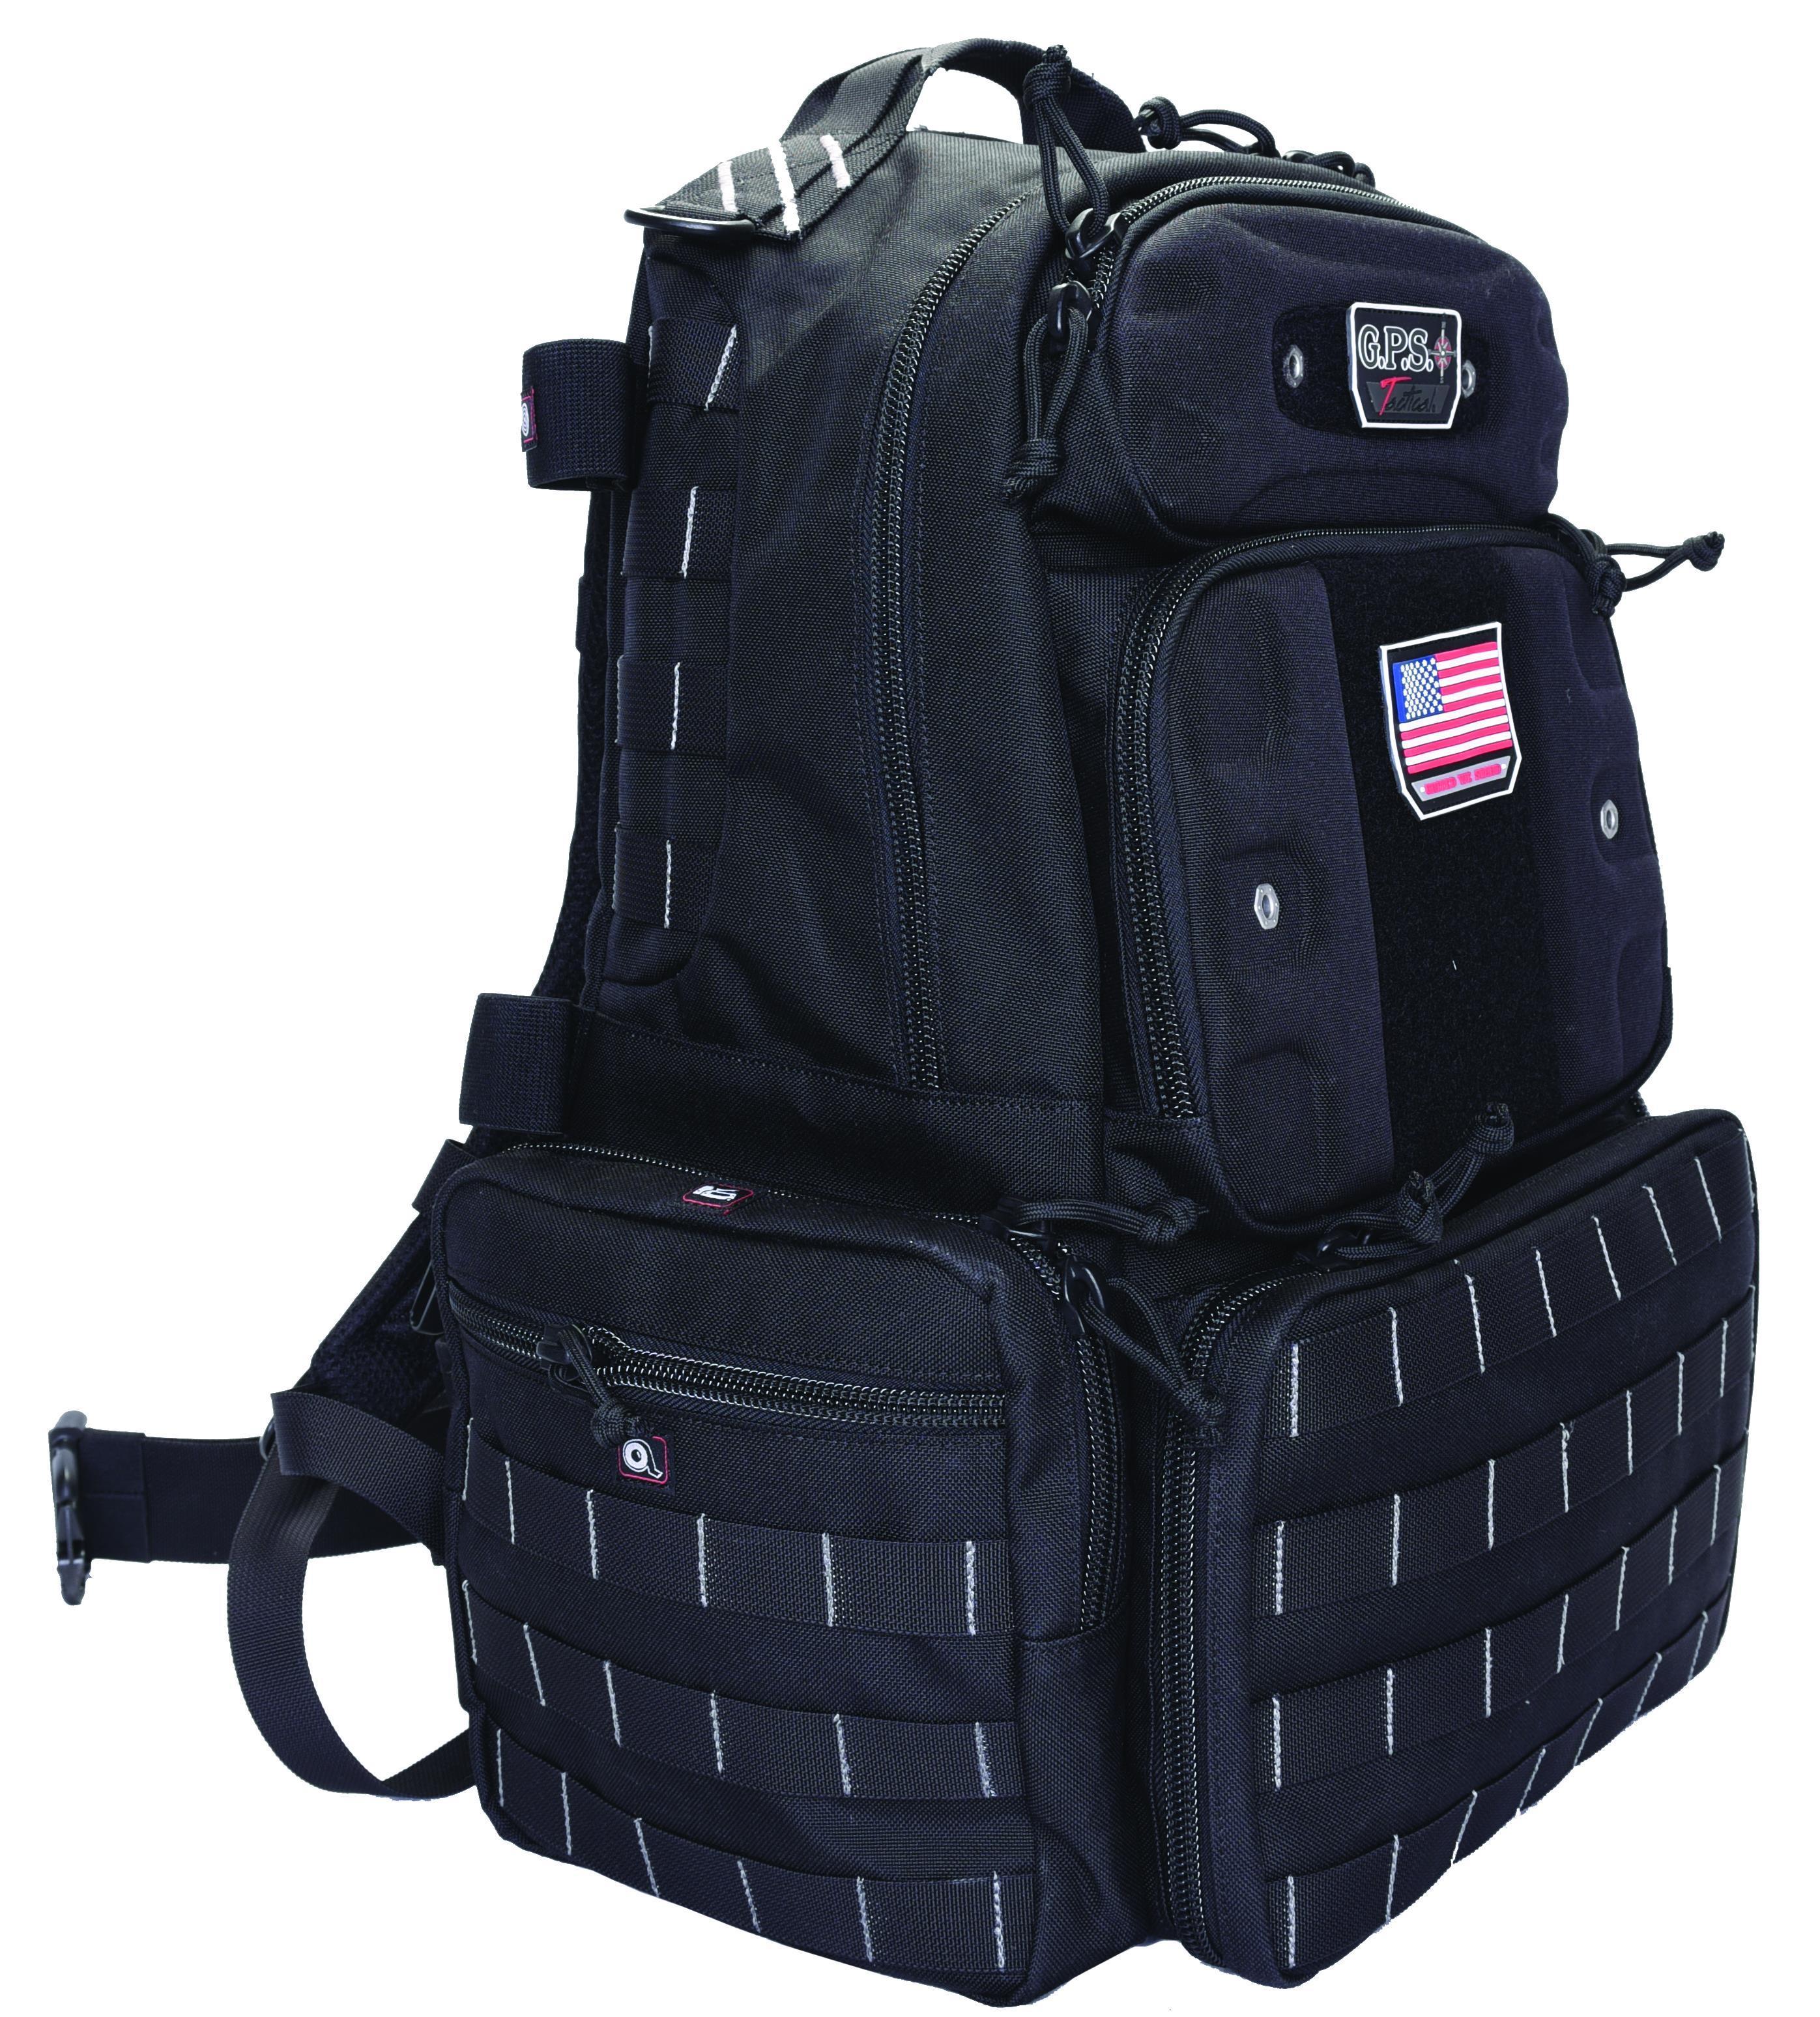 GPS Tactical Range Backpack - Tall